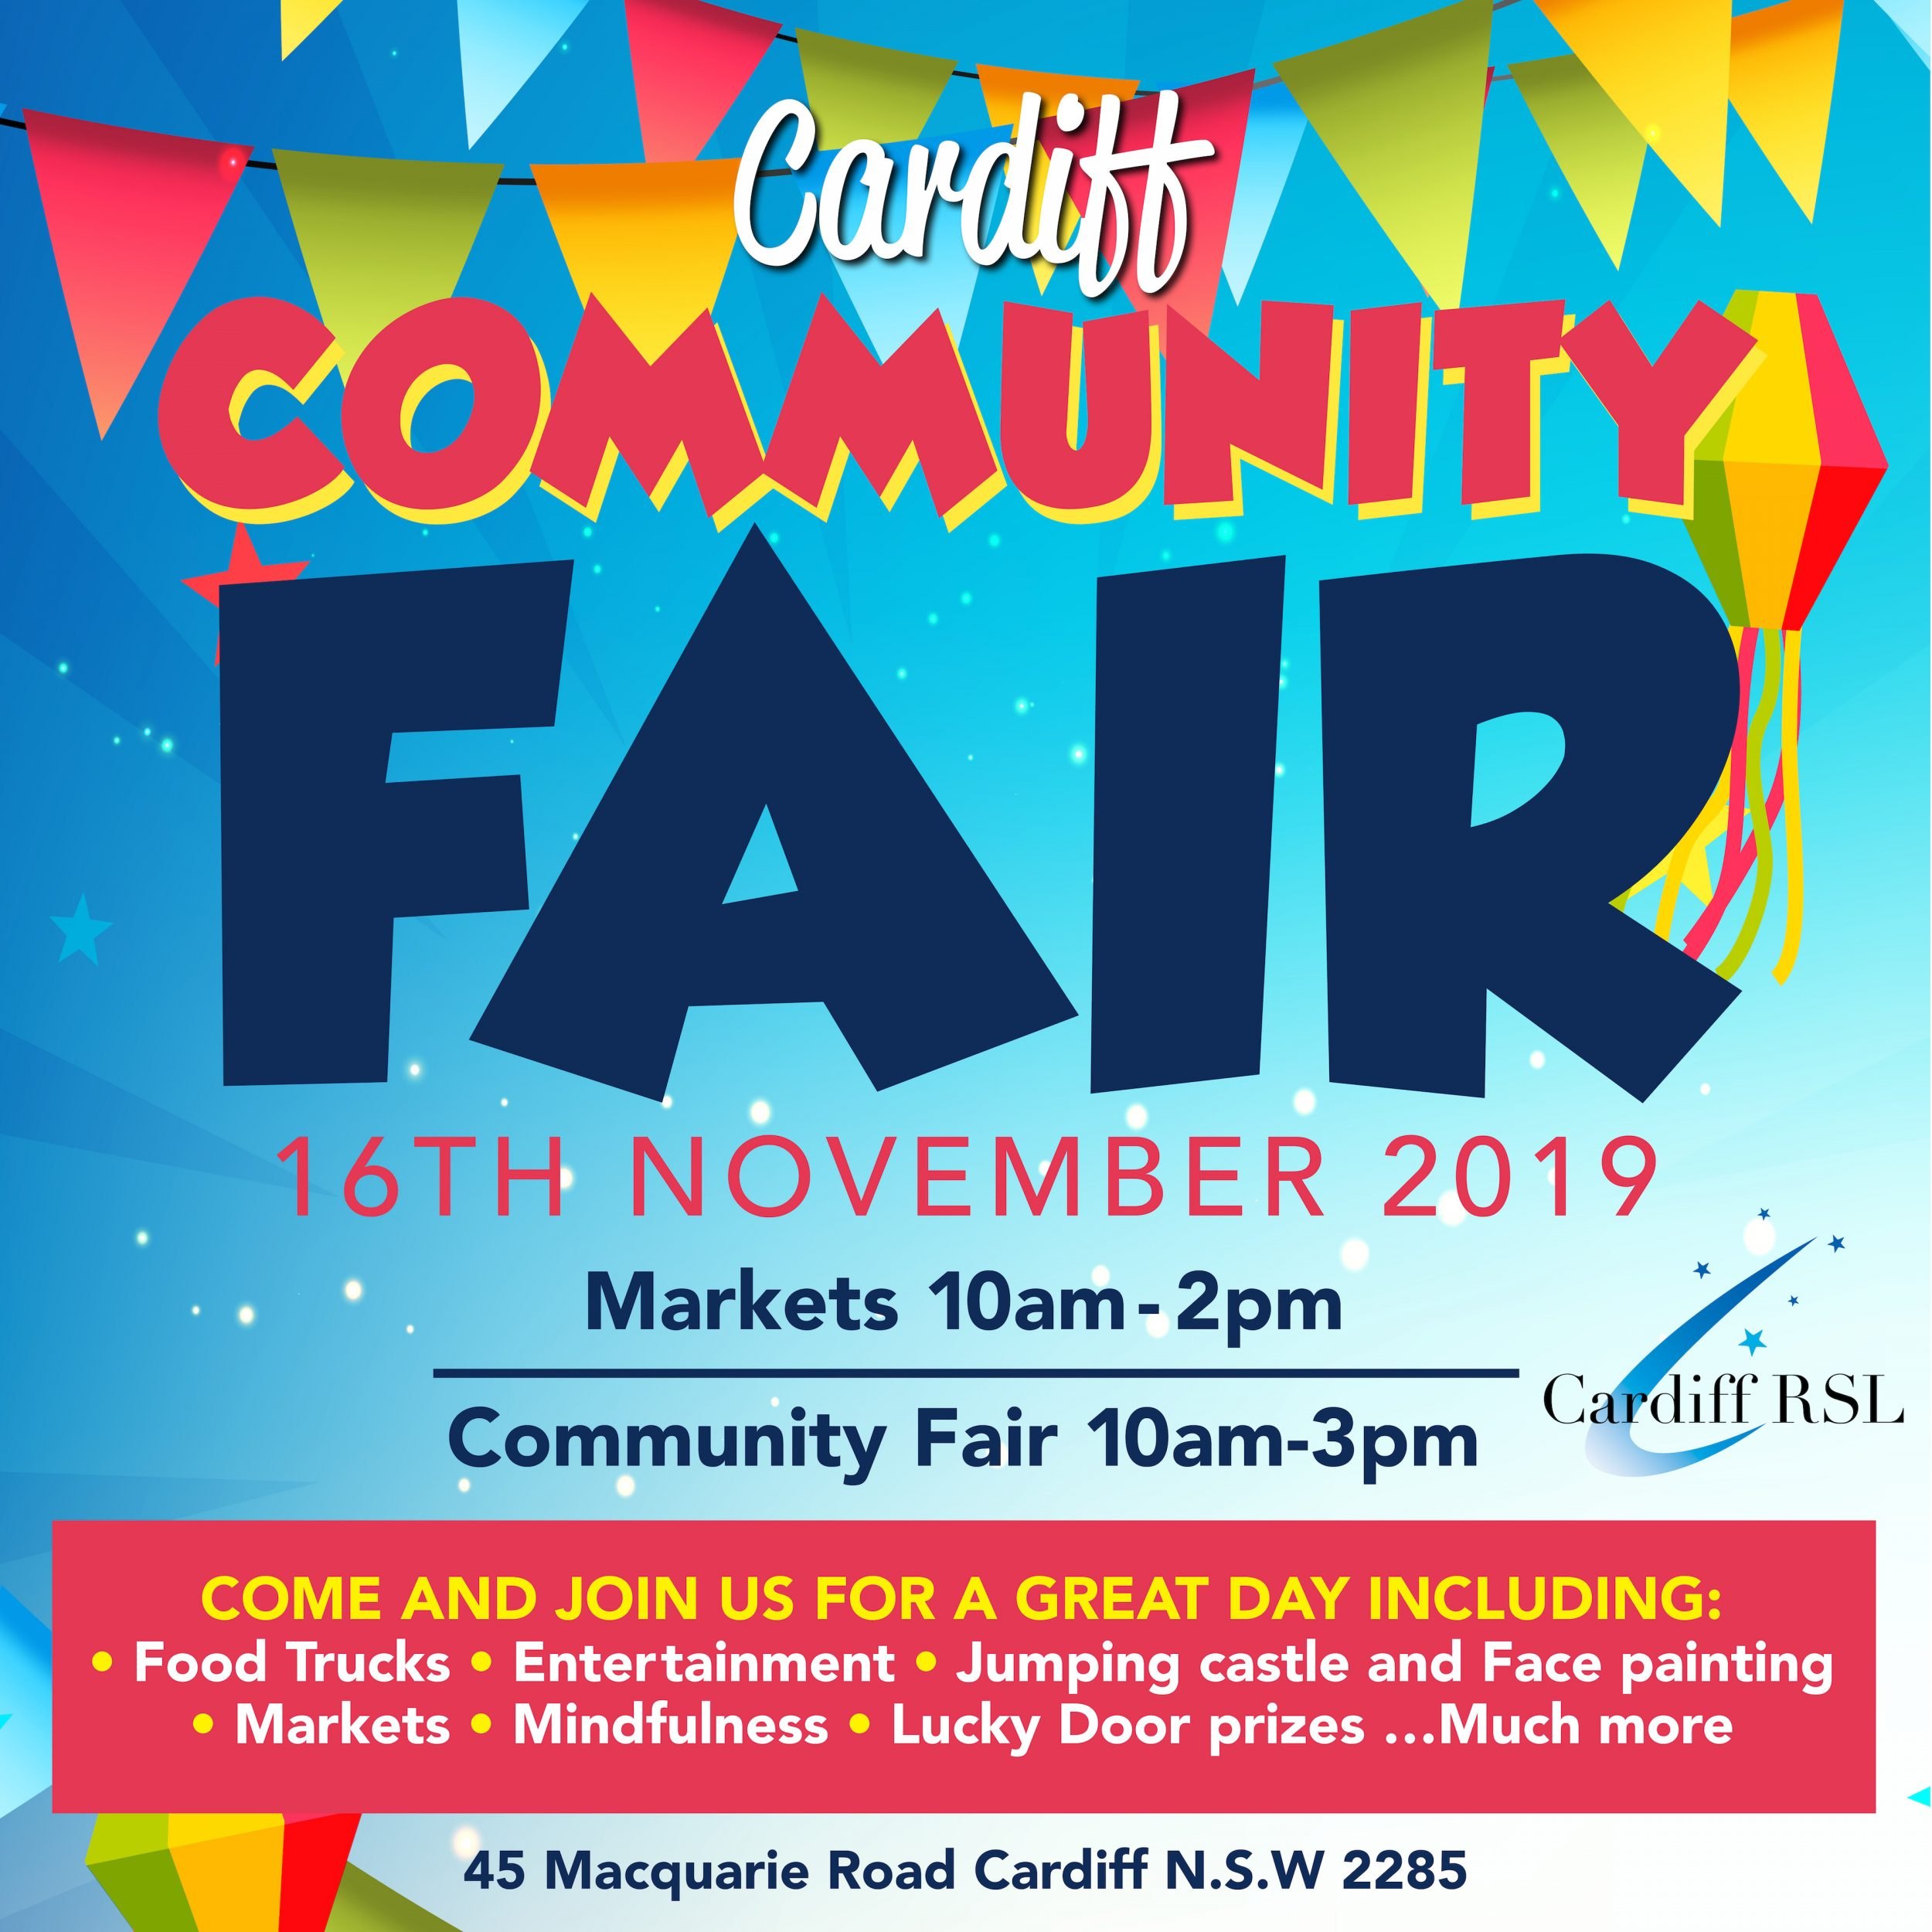 CARDIFF RSL COMMUNITY FAIR